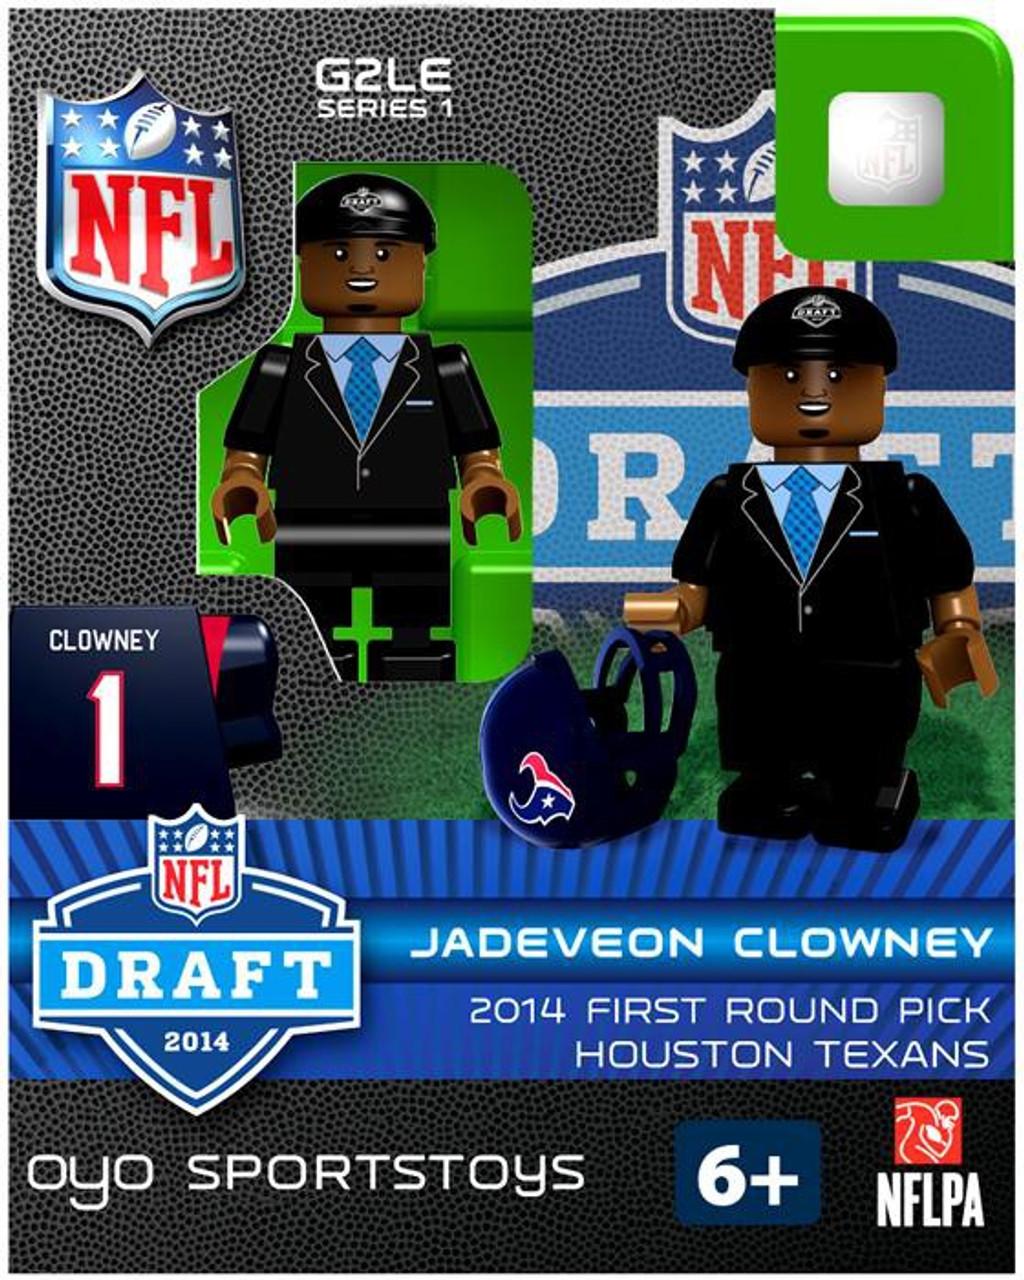 Houston Texans NFL 2014 Draft First Round Picks Jadeveon Clowney Minifigure